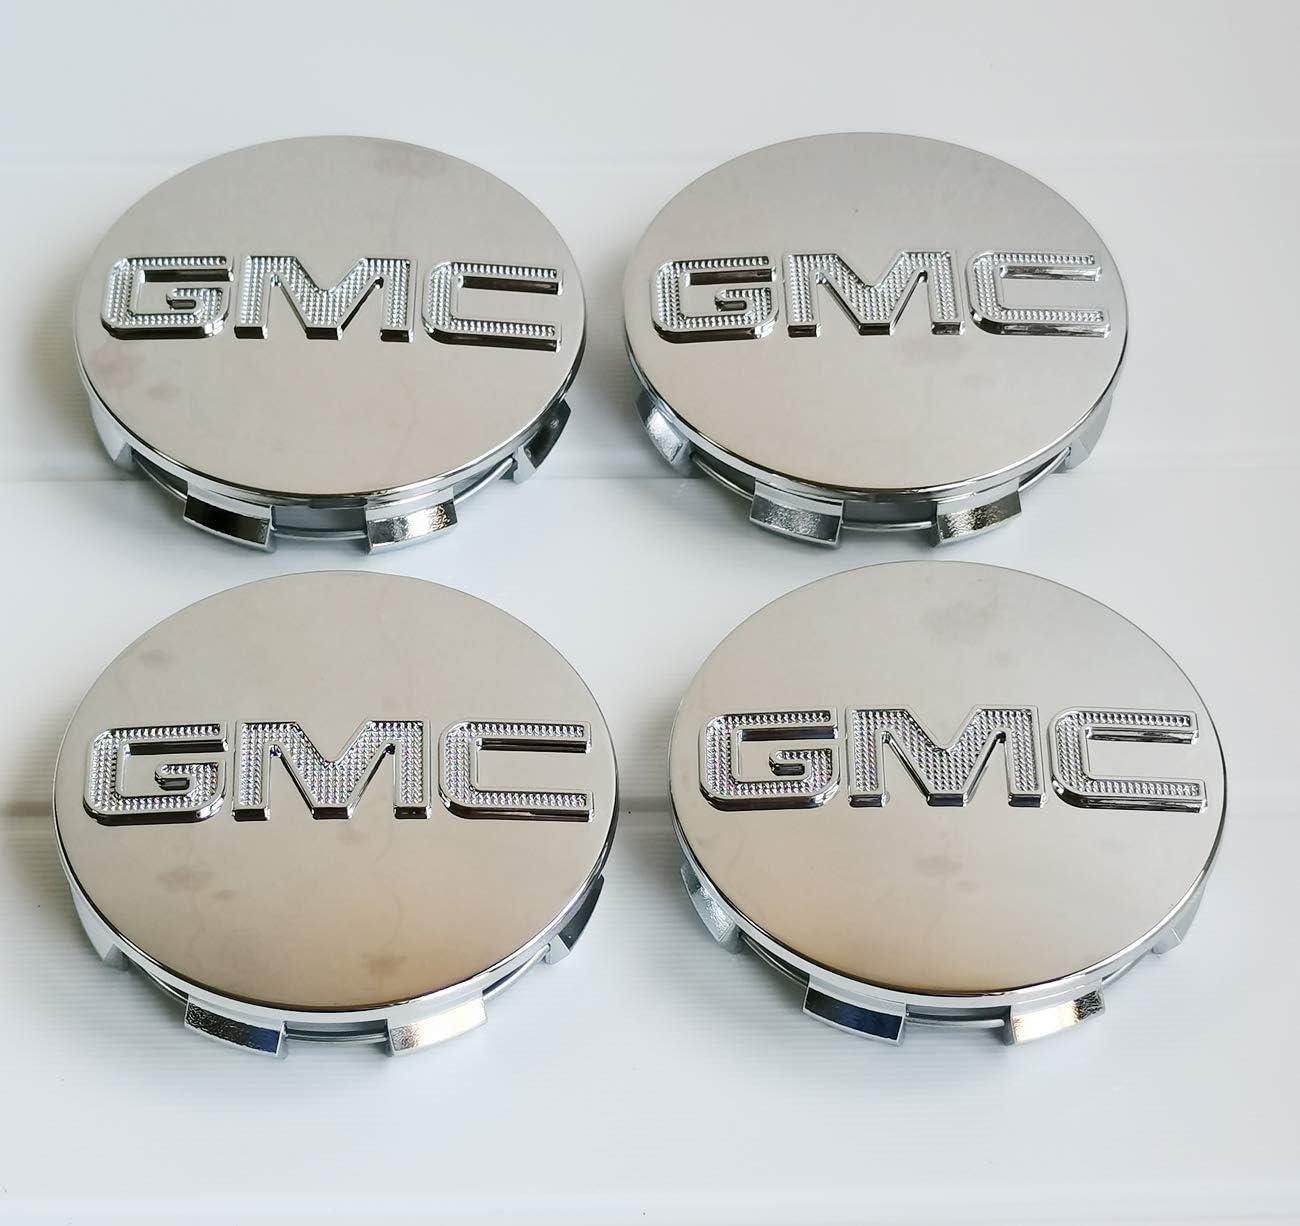 Black B 4Pieces Set,GMC Black B Wheel Center Hub Caps Emblem 83mm //3.25 GMC Rim Center Hubs Fit for GMC Denali Sierra Yukon 18 20 22Wheel 9595759